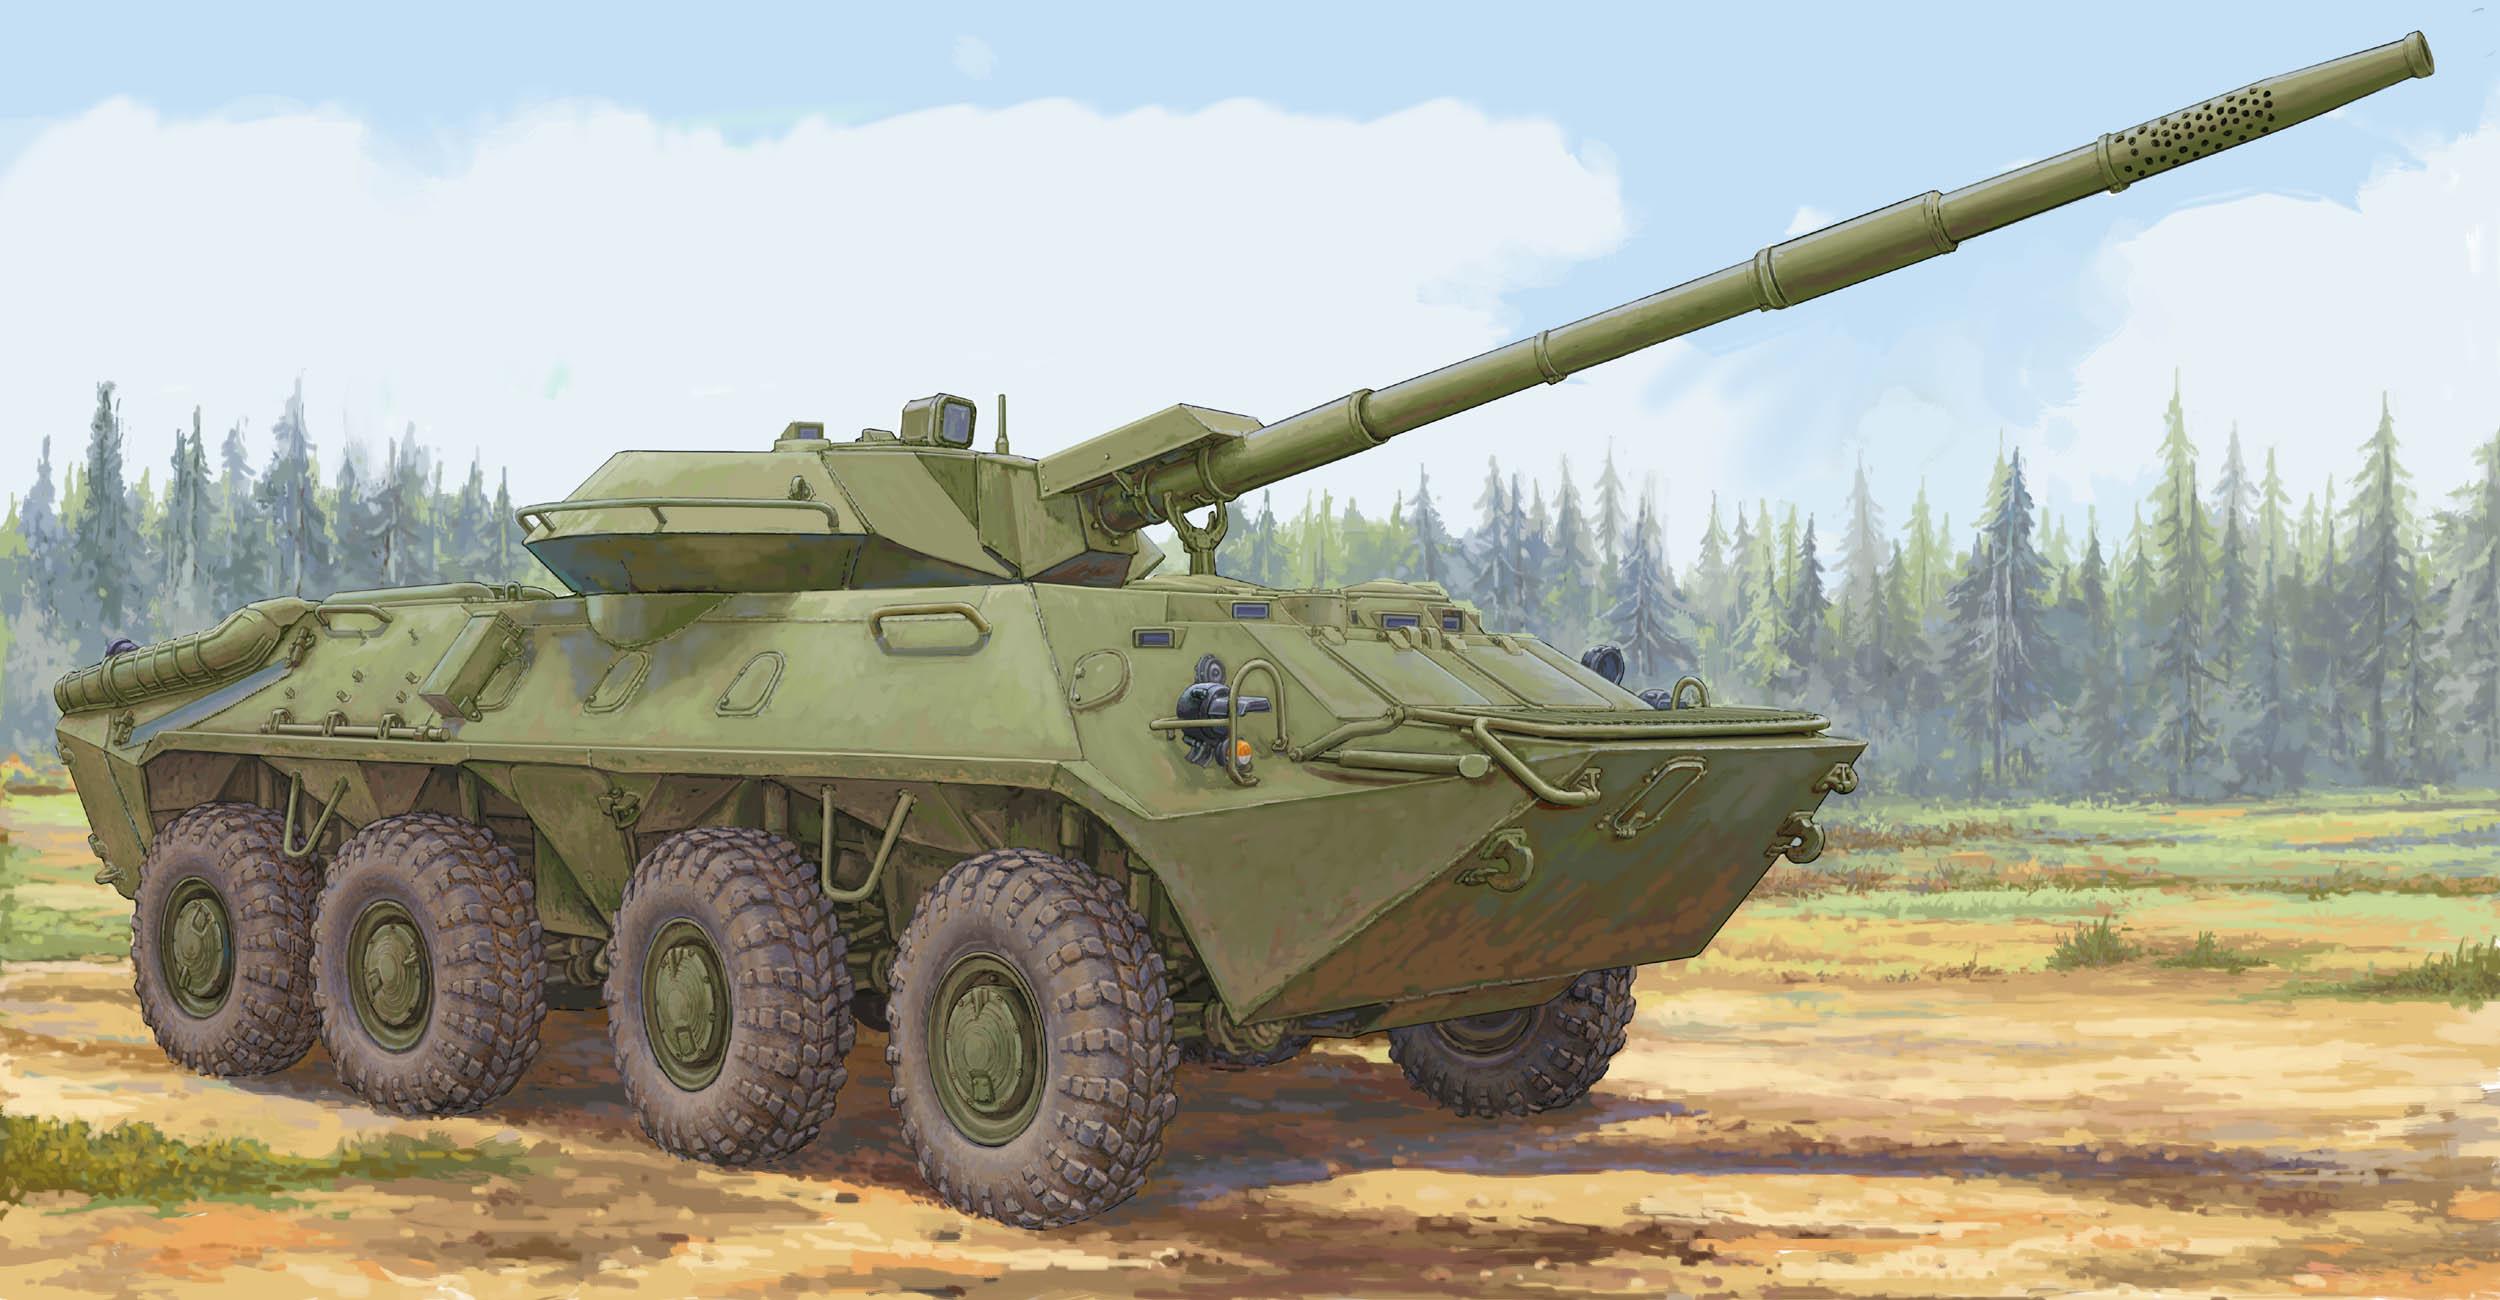 Sowjetische 2s14 zhalo-s 85mm anti - panzer - waffe 09536 trompeter kit.